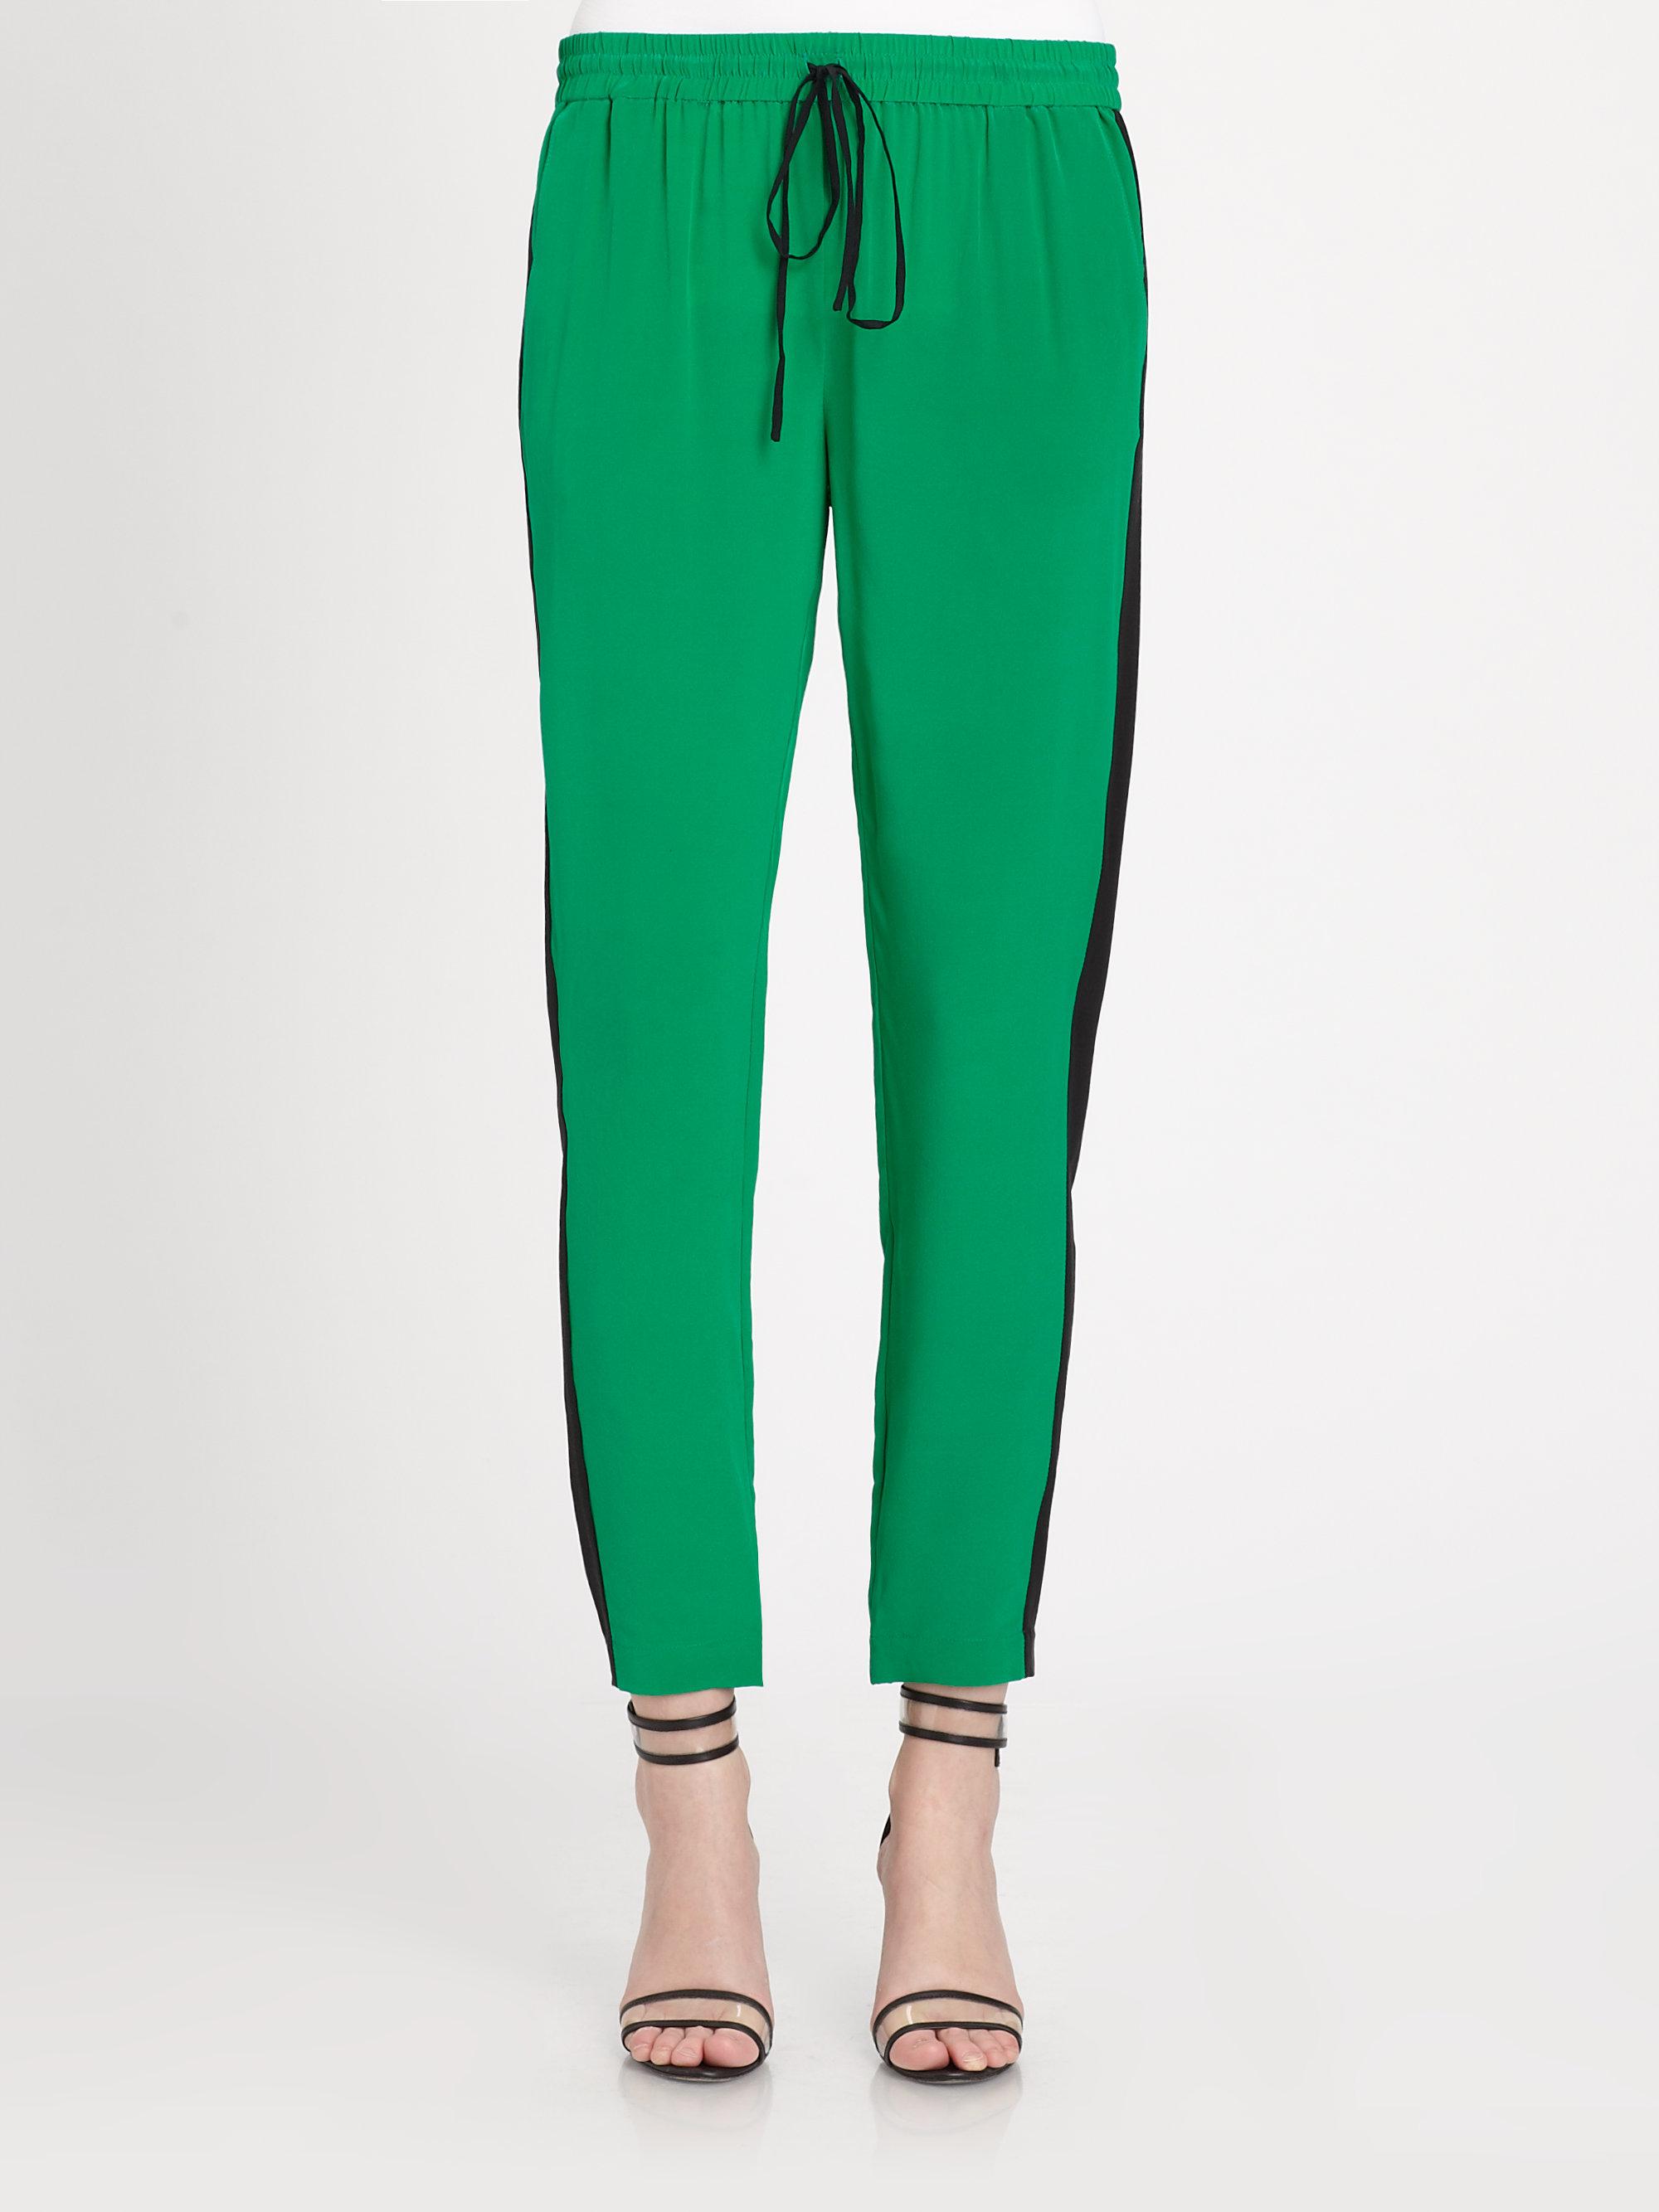 Tibi Silk Track Pants in Green | Lyst